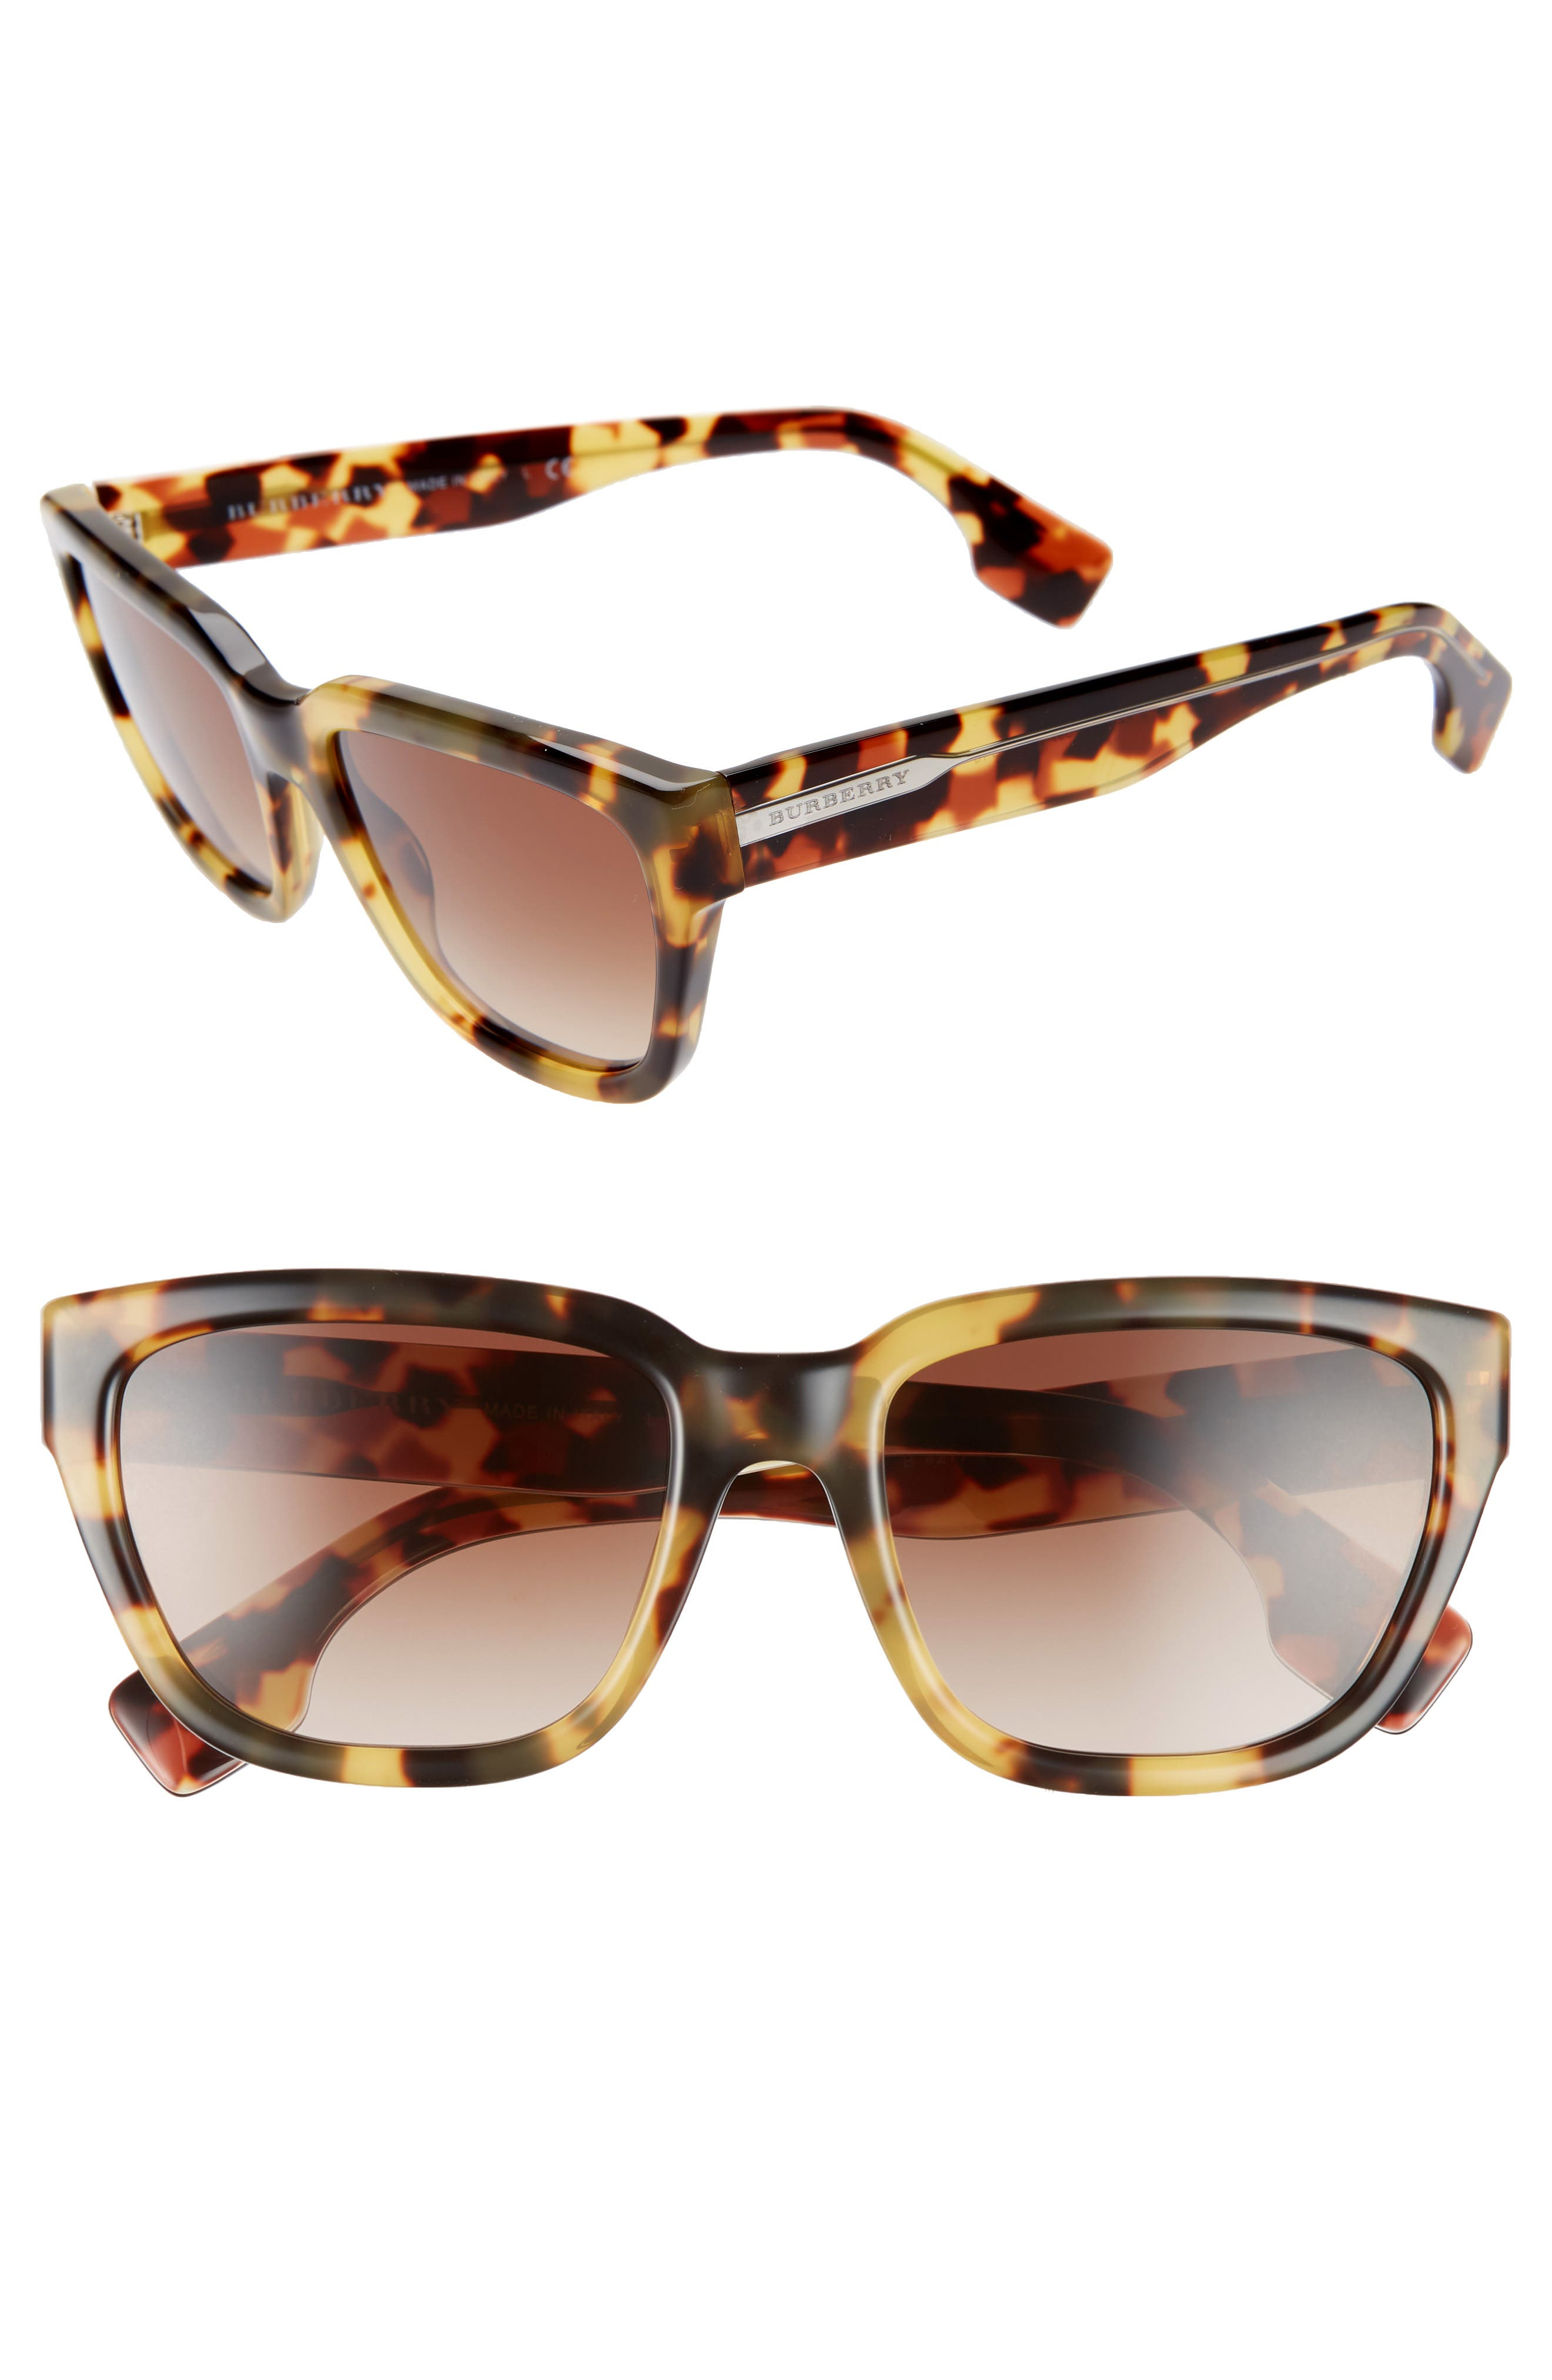 54mm Square Sunglasses,                             Main thumbnail 1, color,                             LITE HAVANA/ BROWN GRADIENT